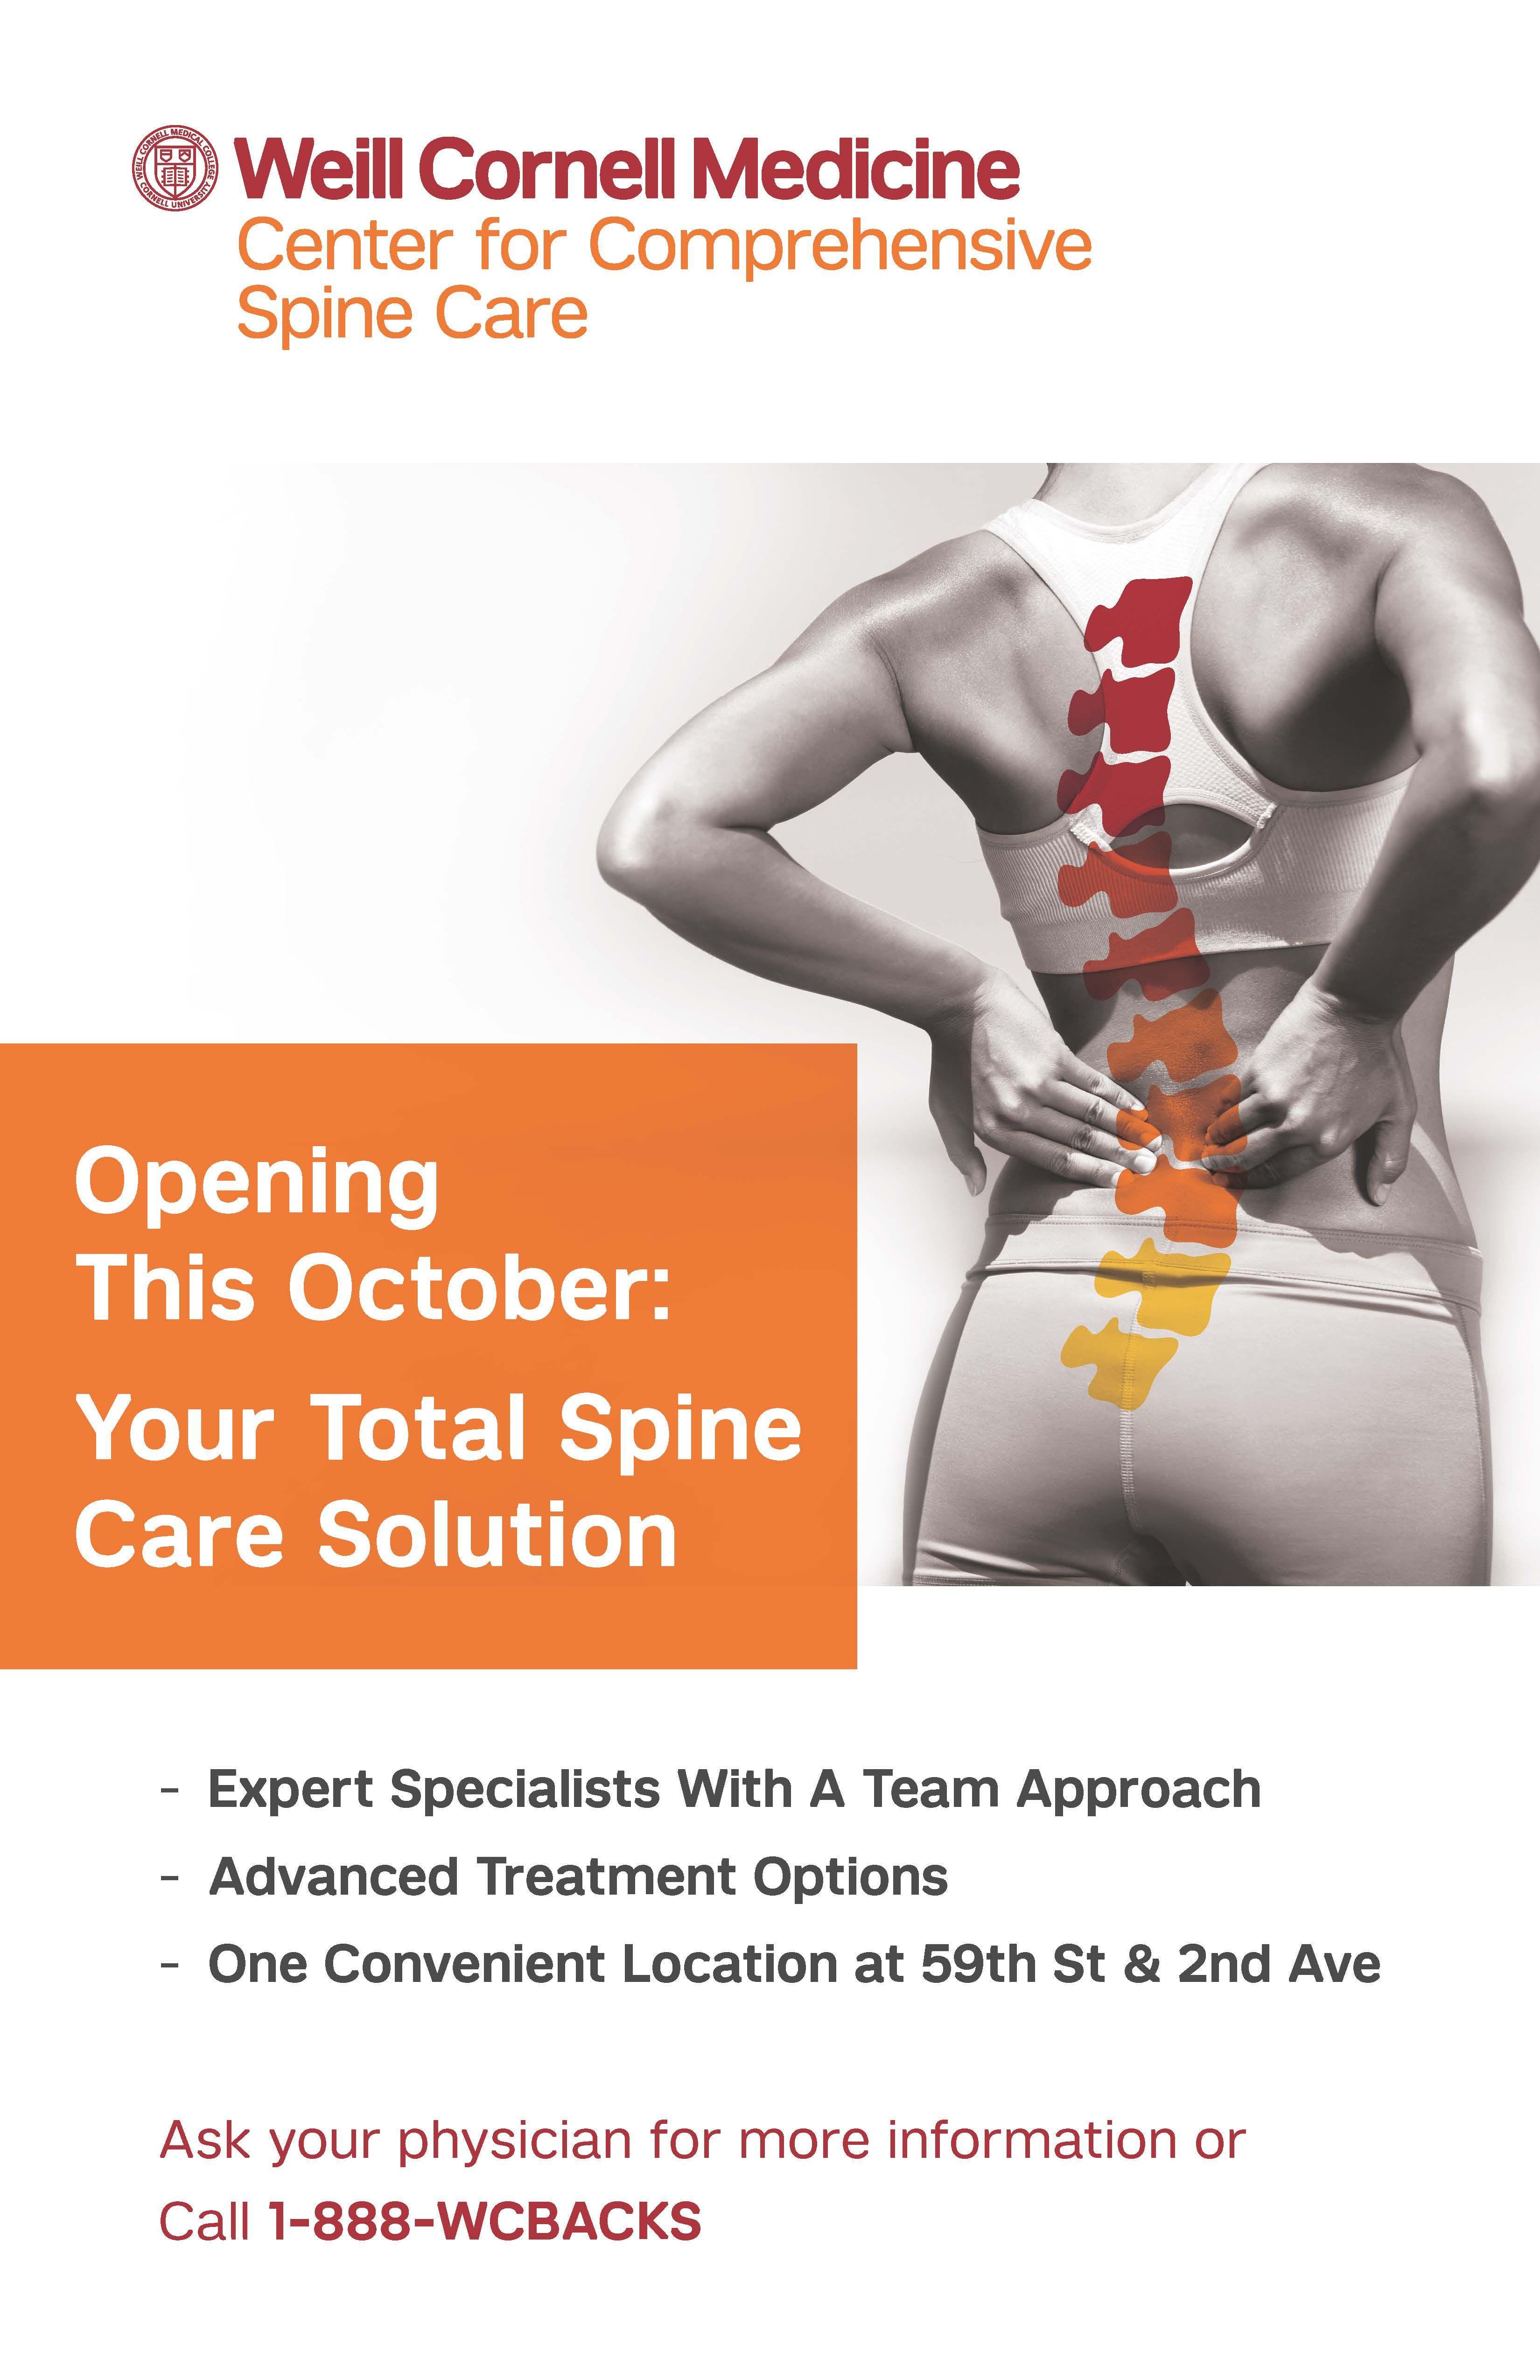 Center for Comprehensive Spine Care